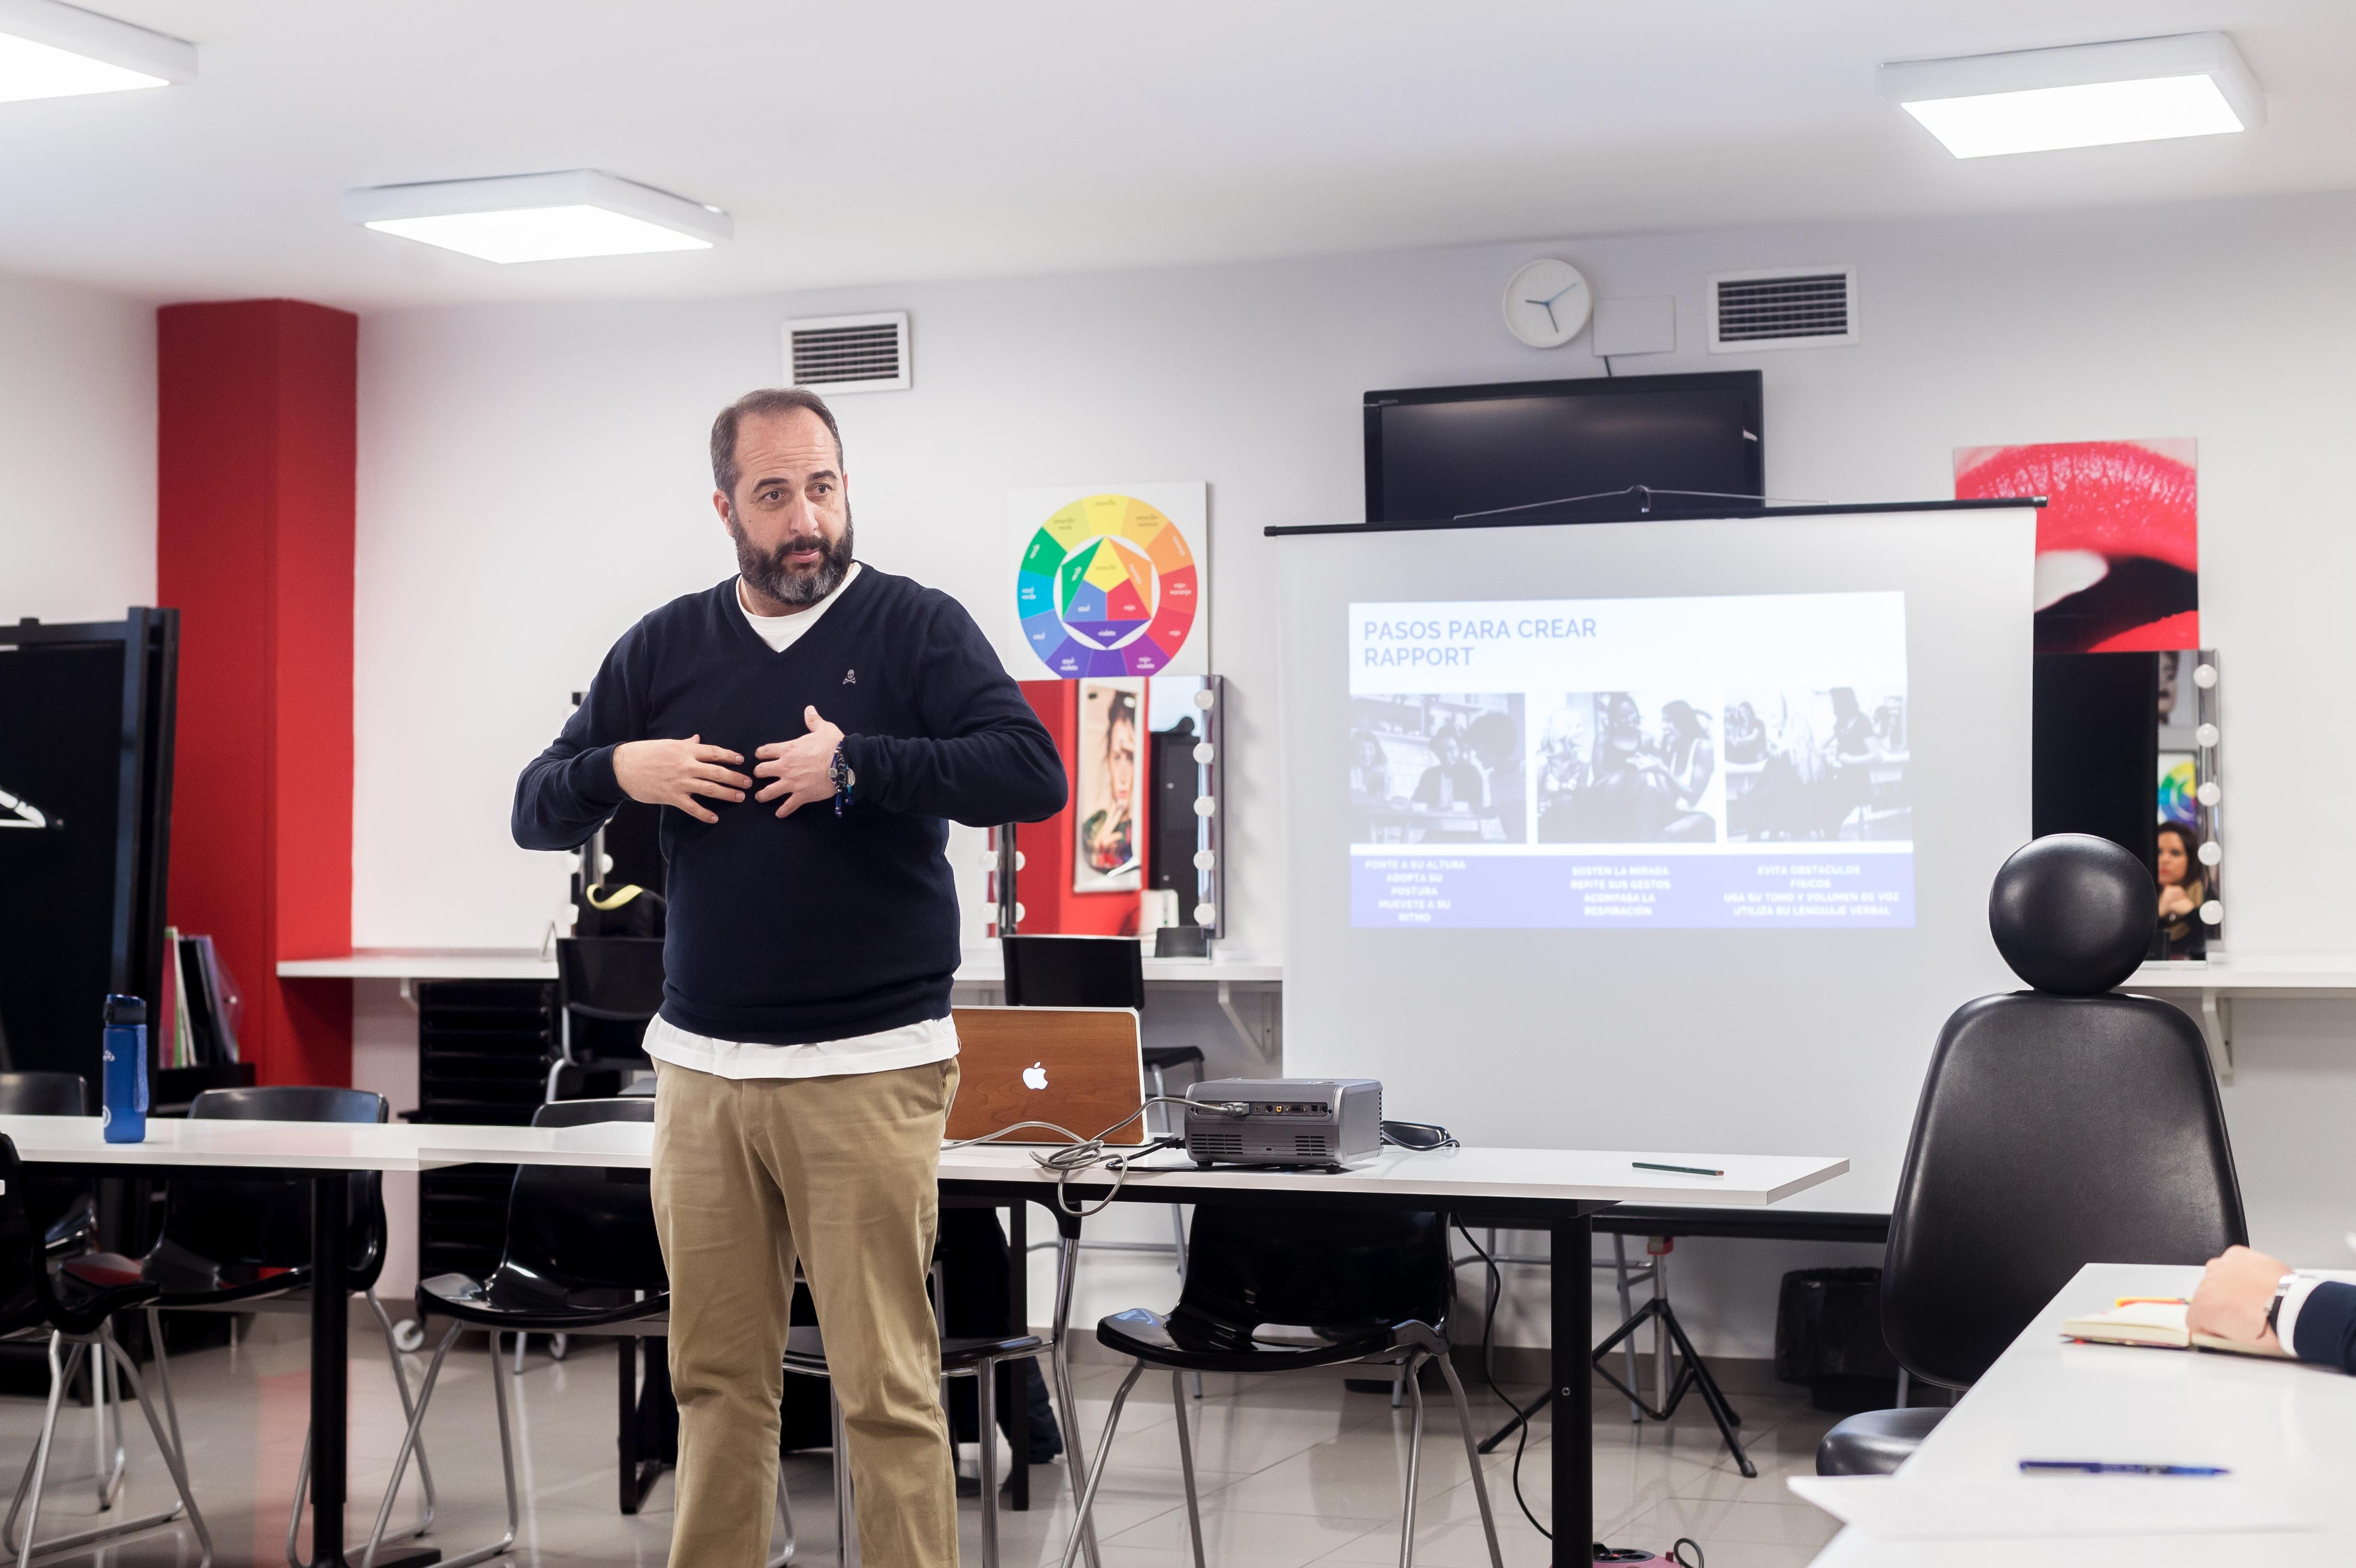 sesion coaching de calidad alicia bravo (5)